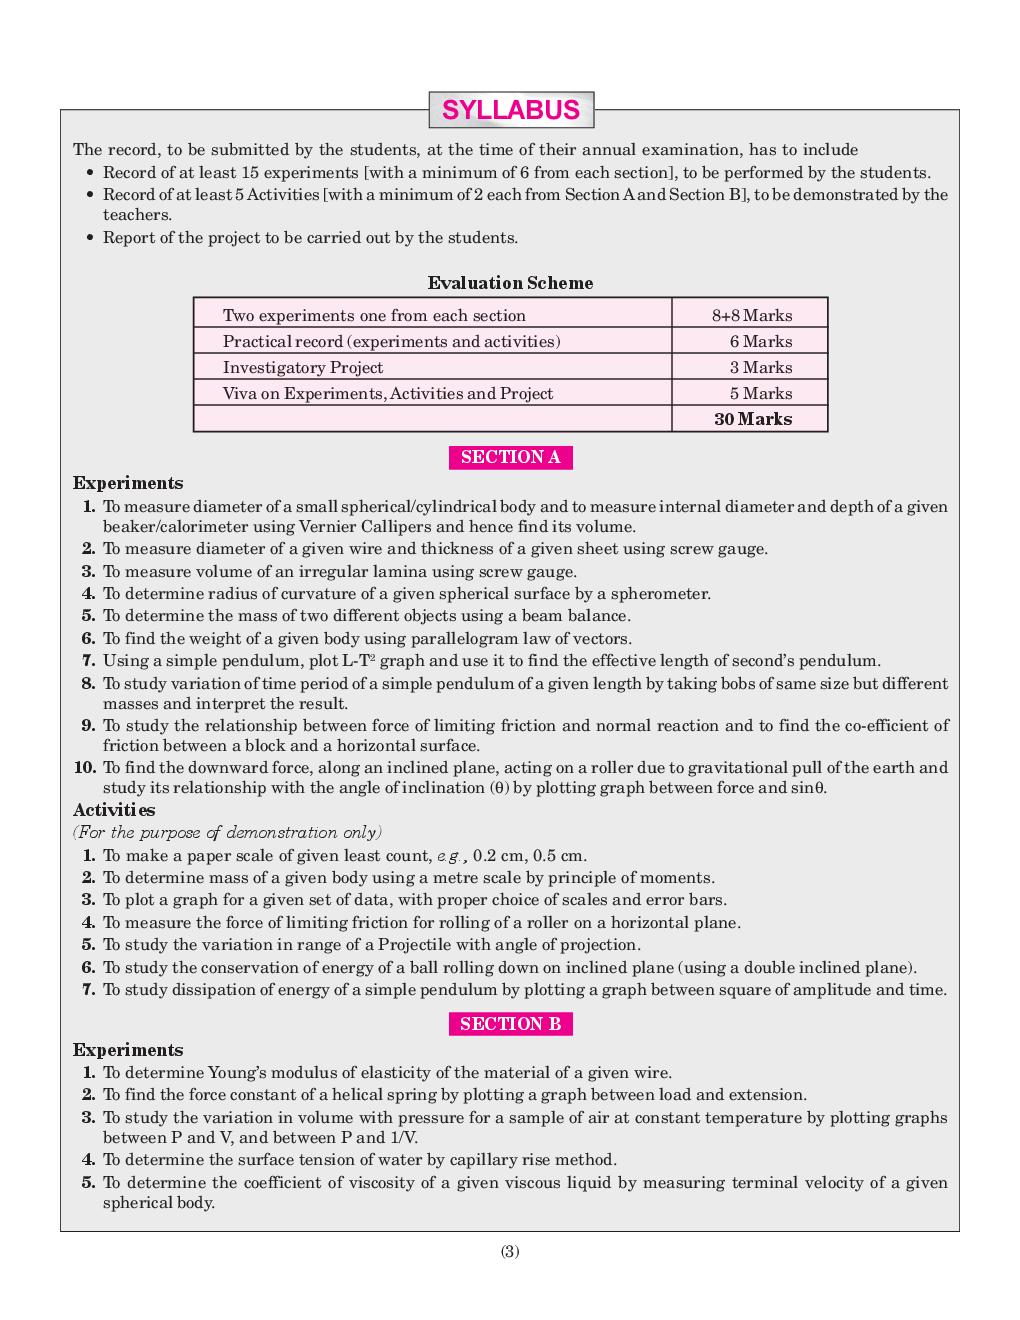 download saraswati lab manual physics class xi by dr r k gupta rh kopykitab com College Physics Lab Manual engineering physics lab manual for first year vtu